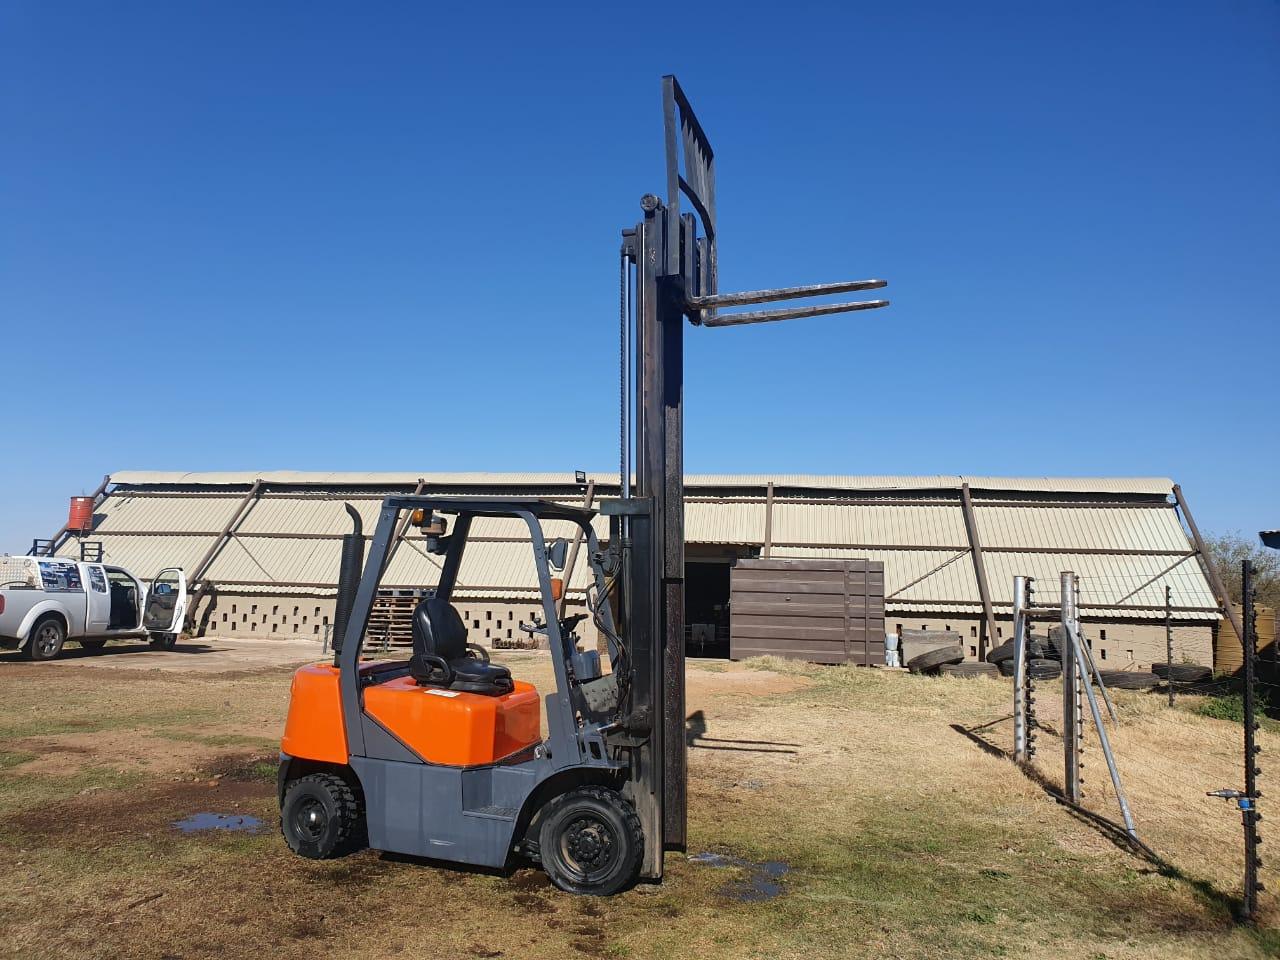 2.5 T Doosan Forklift